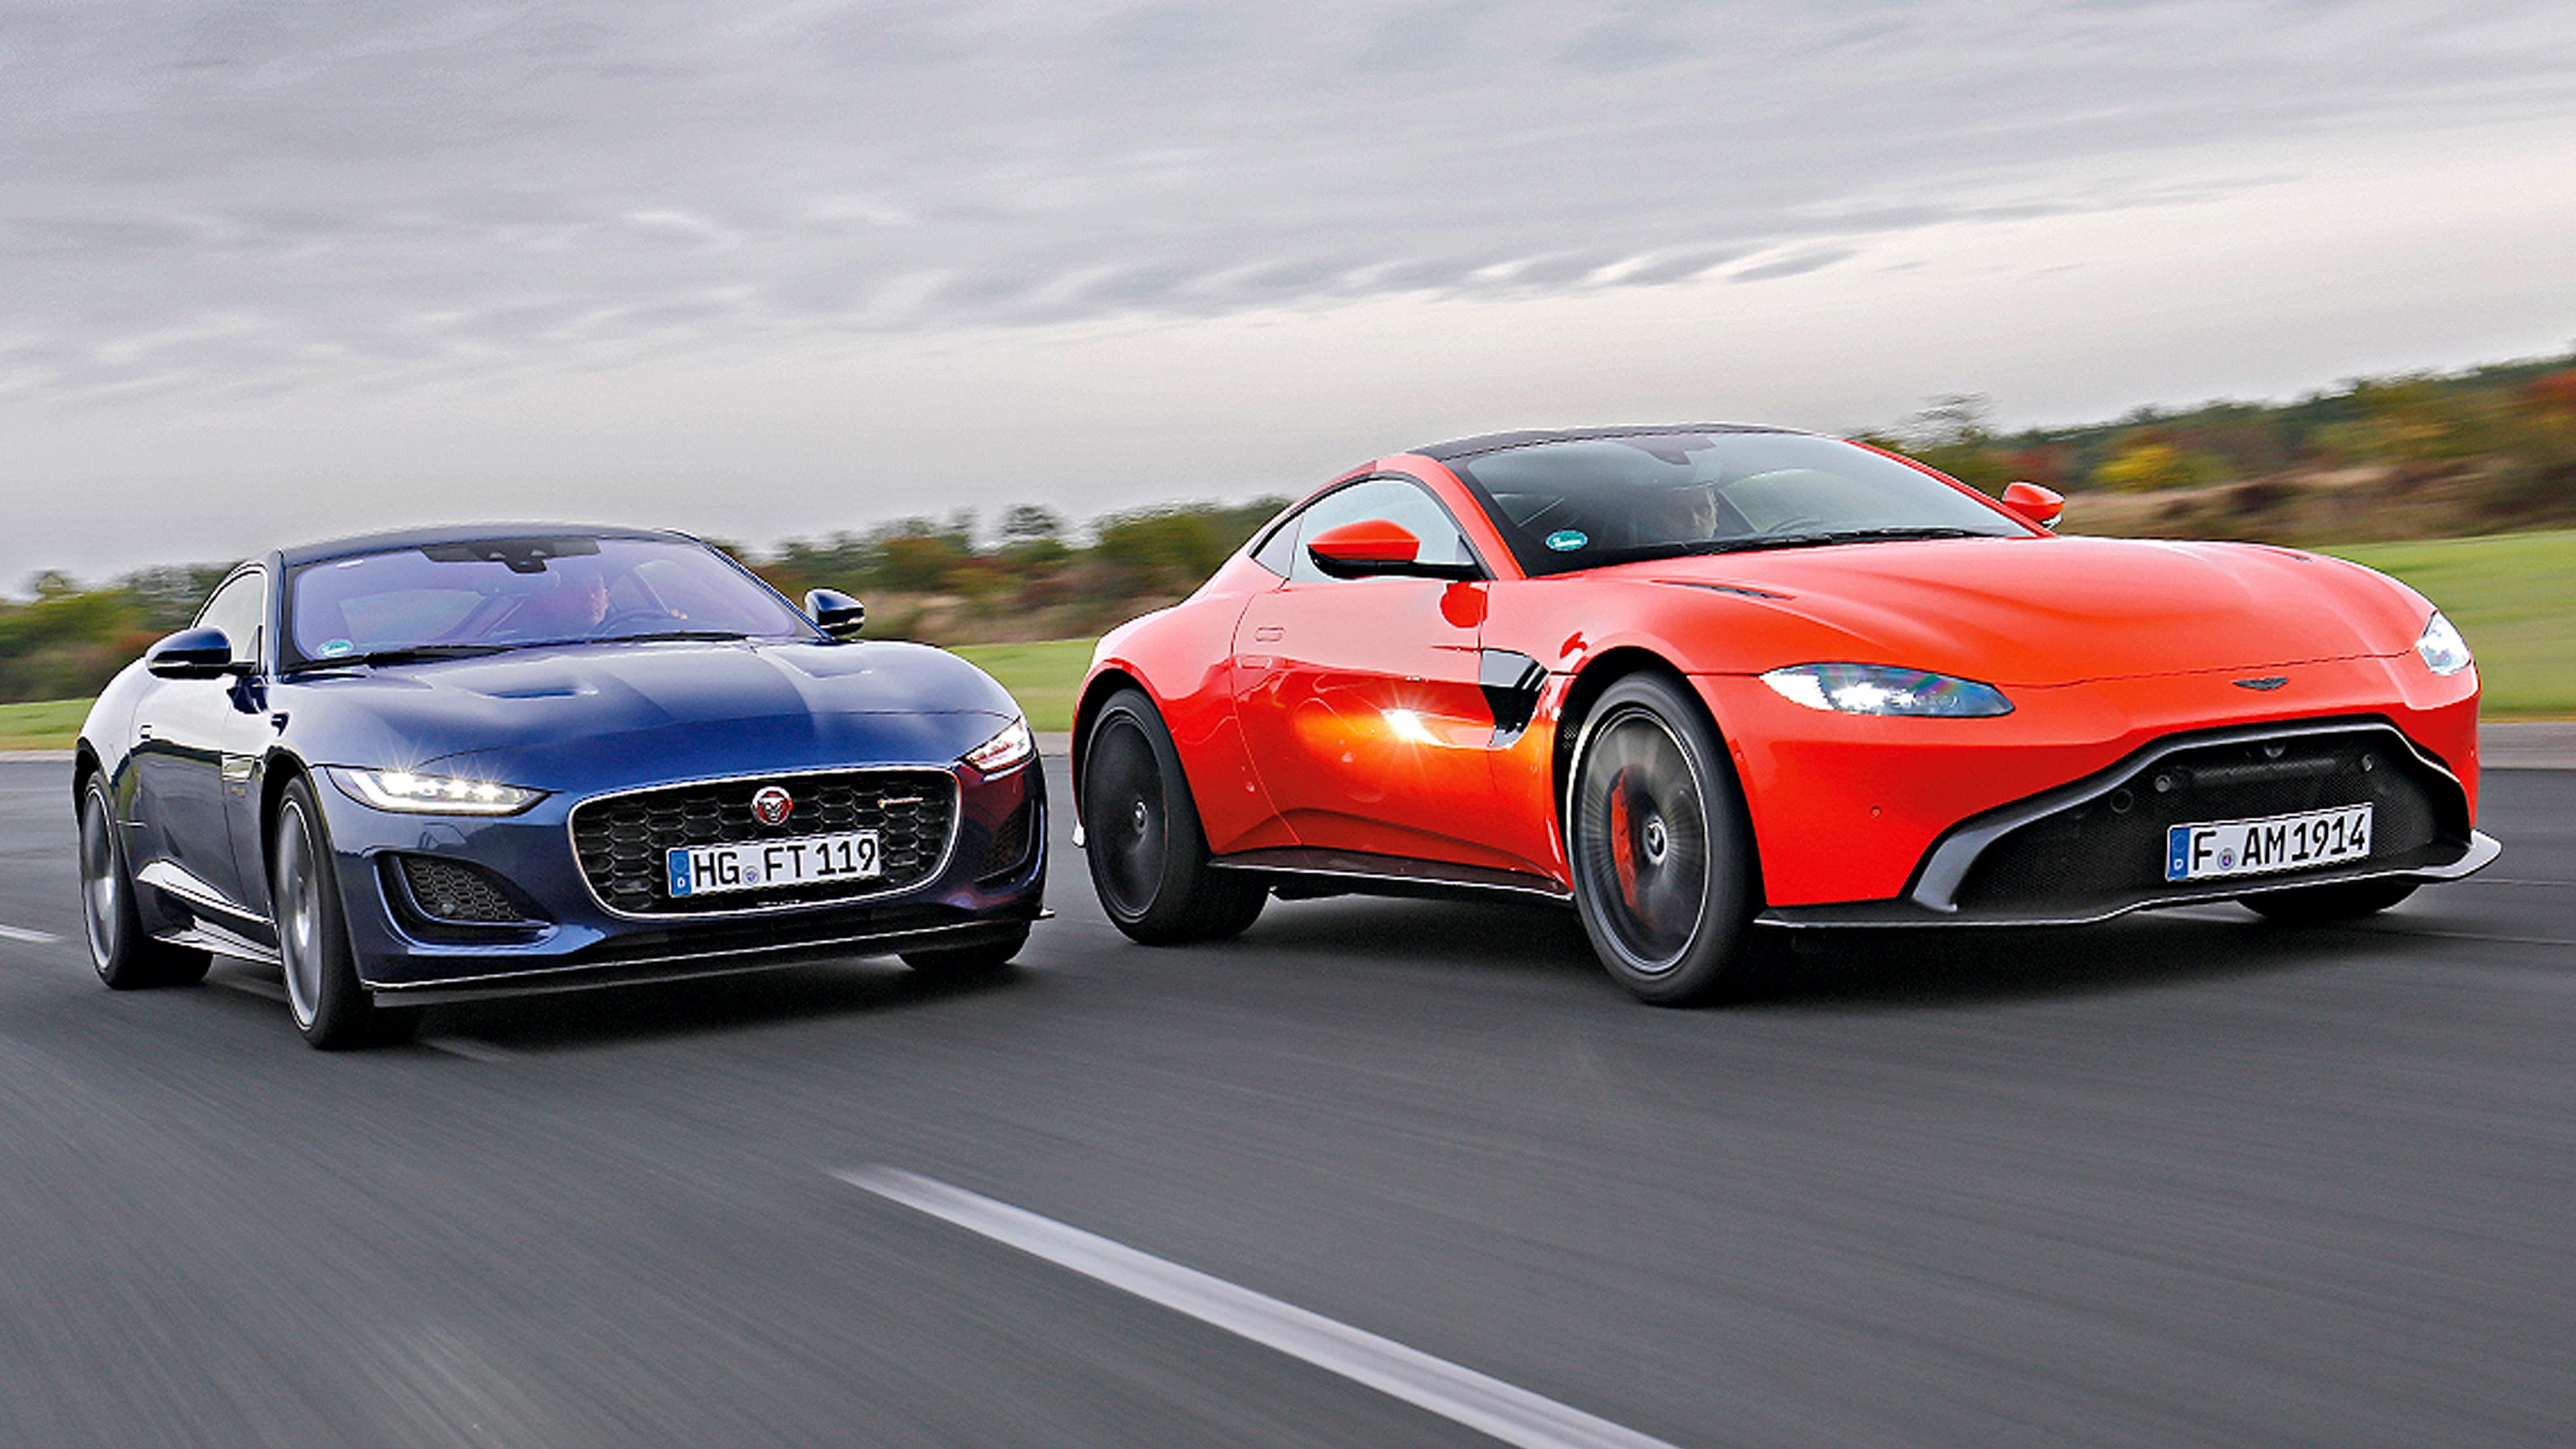 Aston Martin Vantage Vs Jaguar F Type Test V8 Motor Preis Autobild De